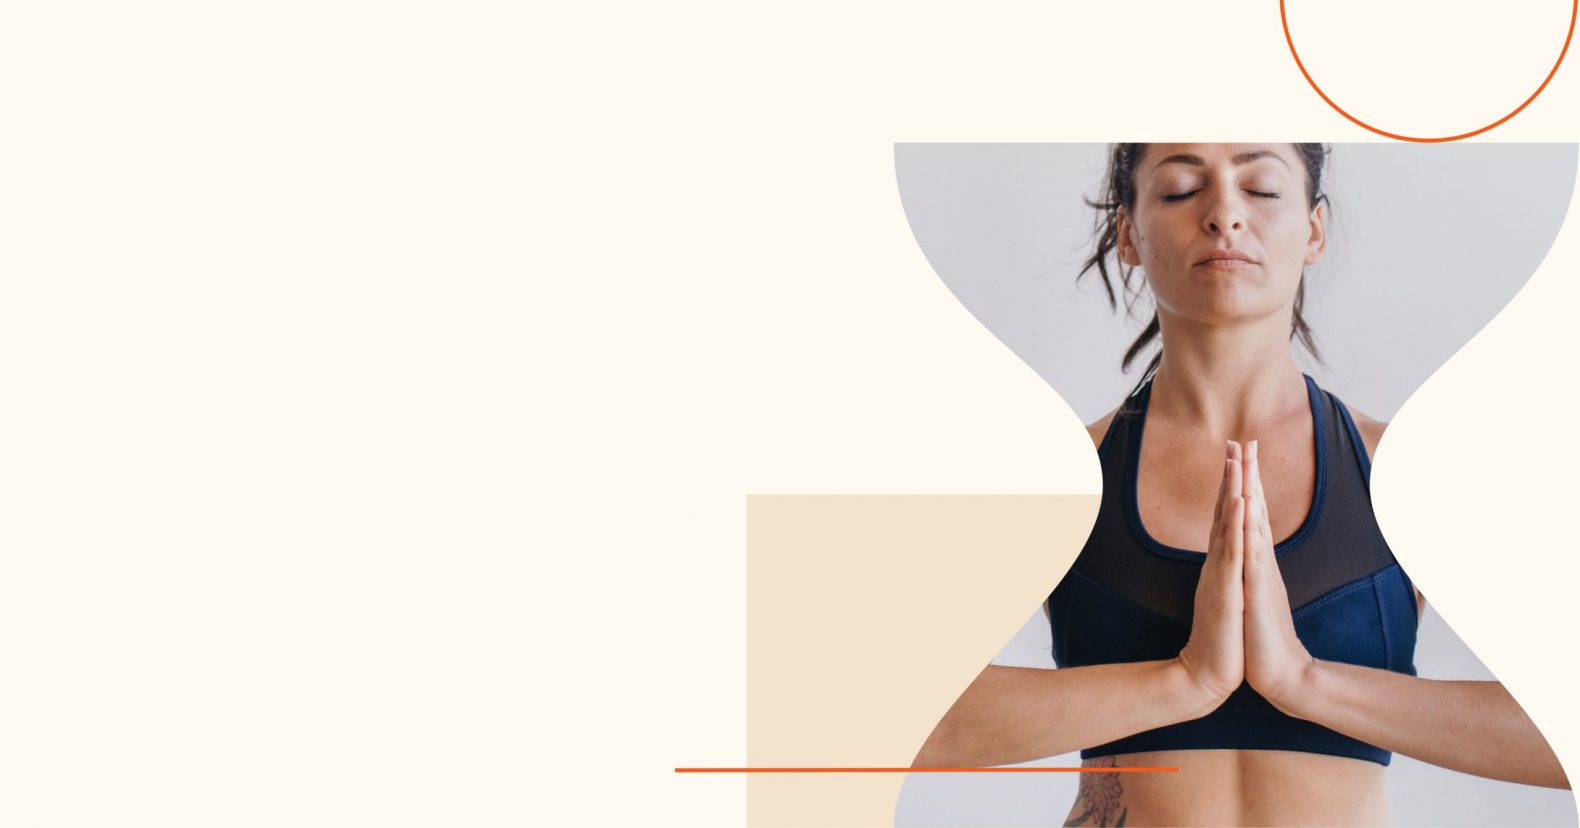 conversion marketing playbook health fitness